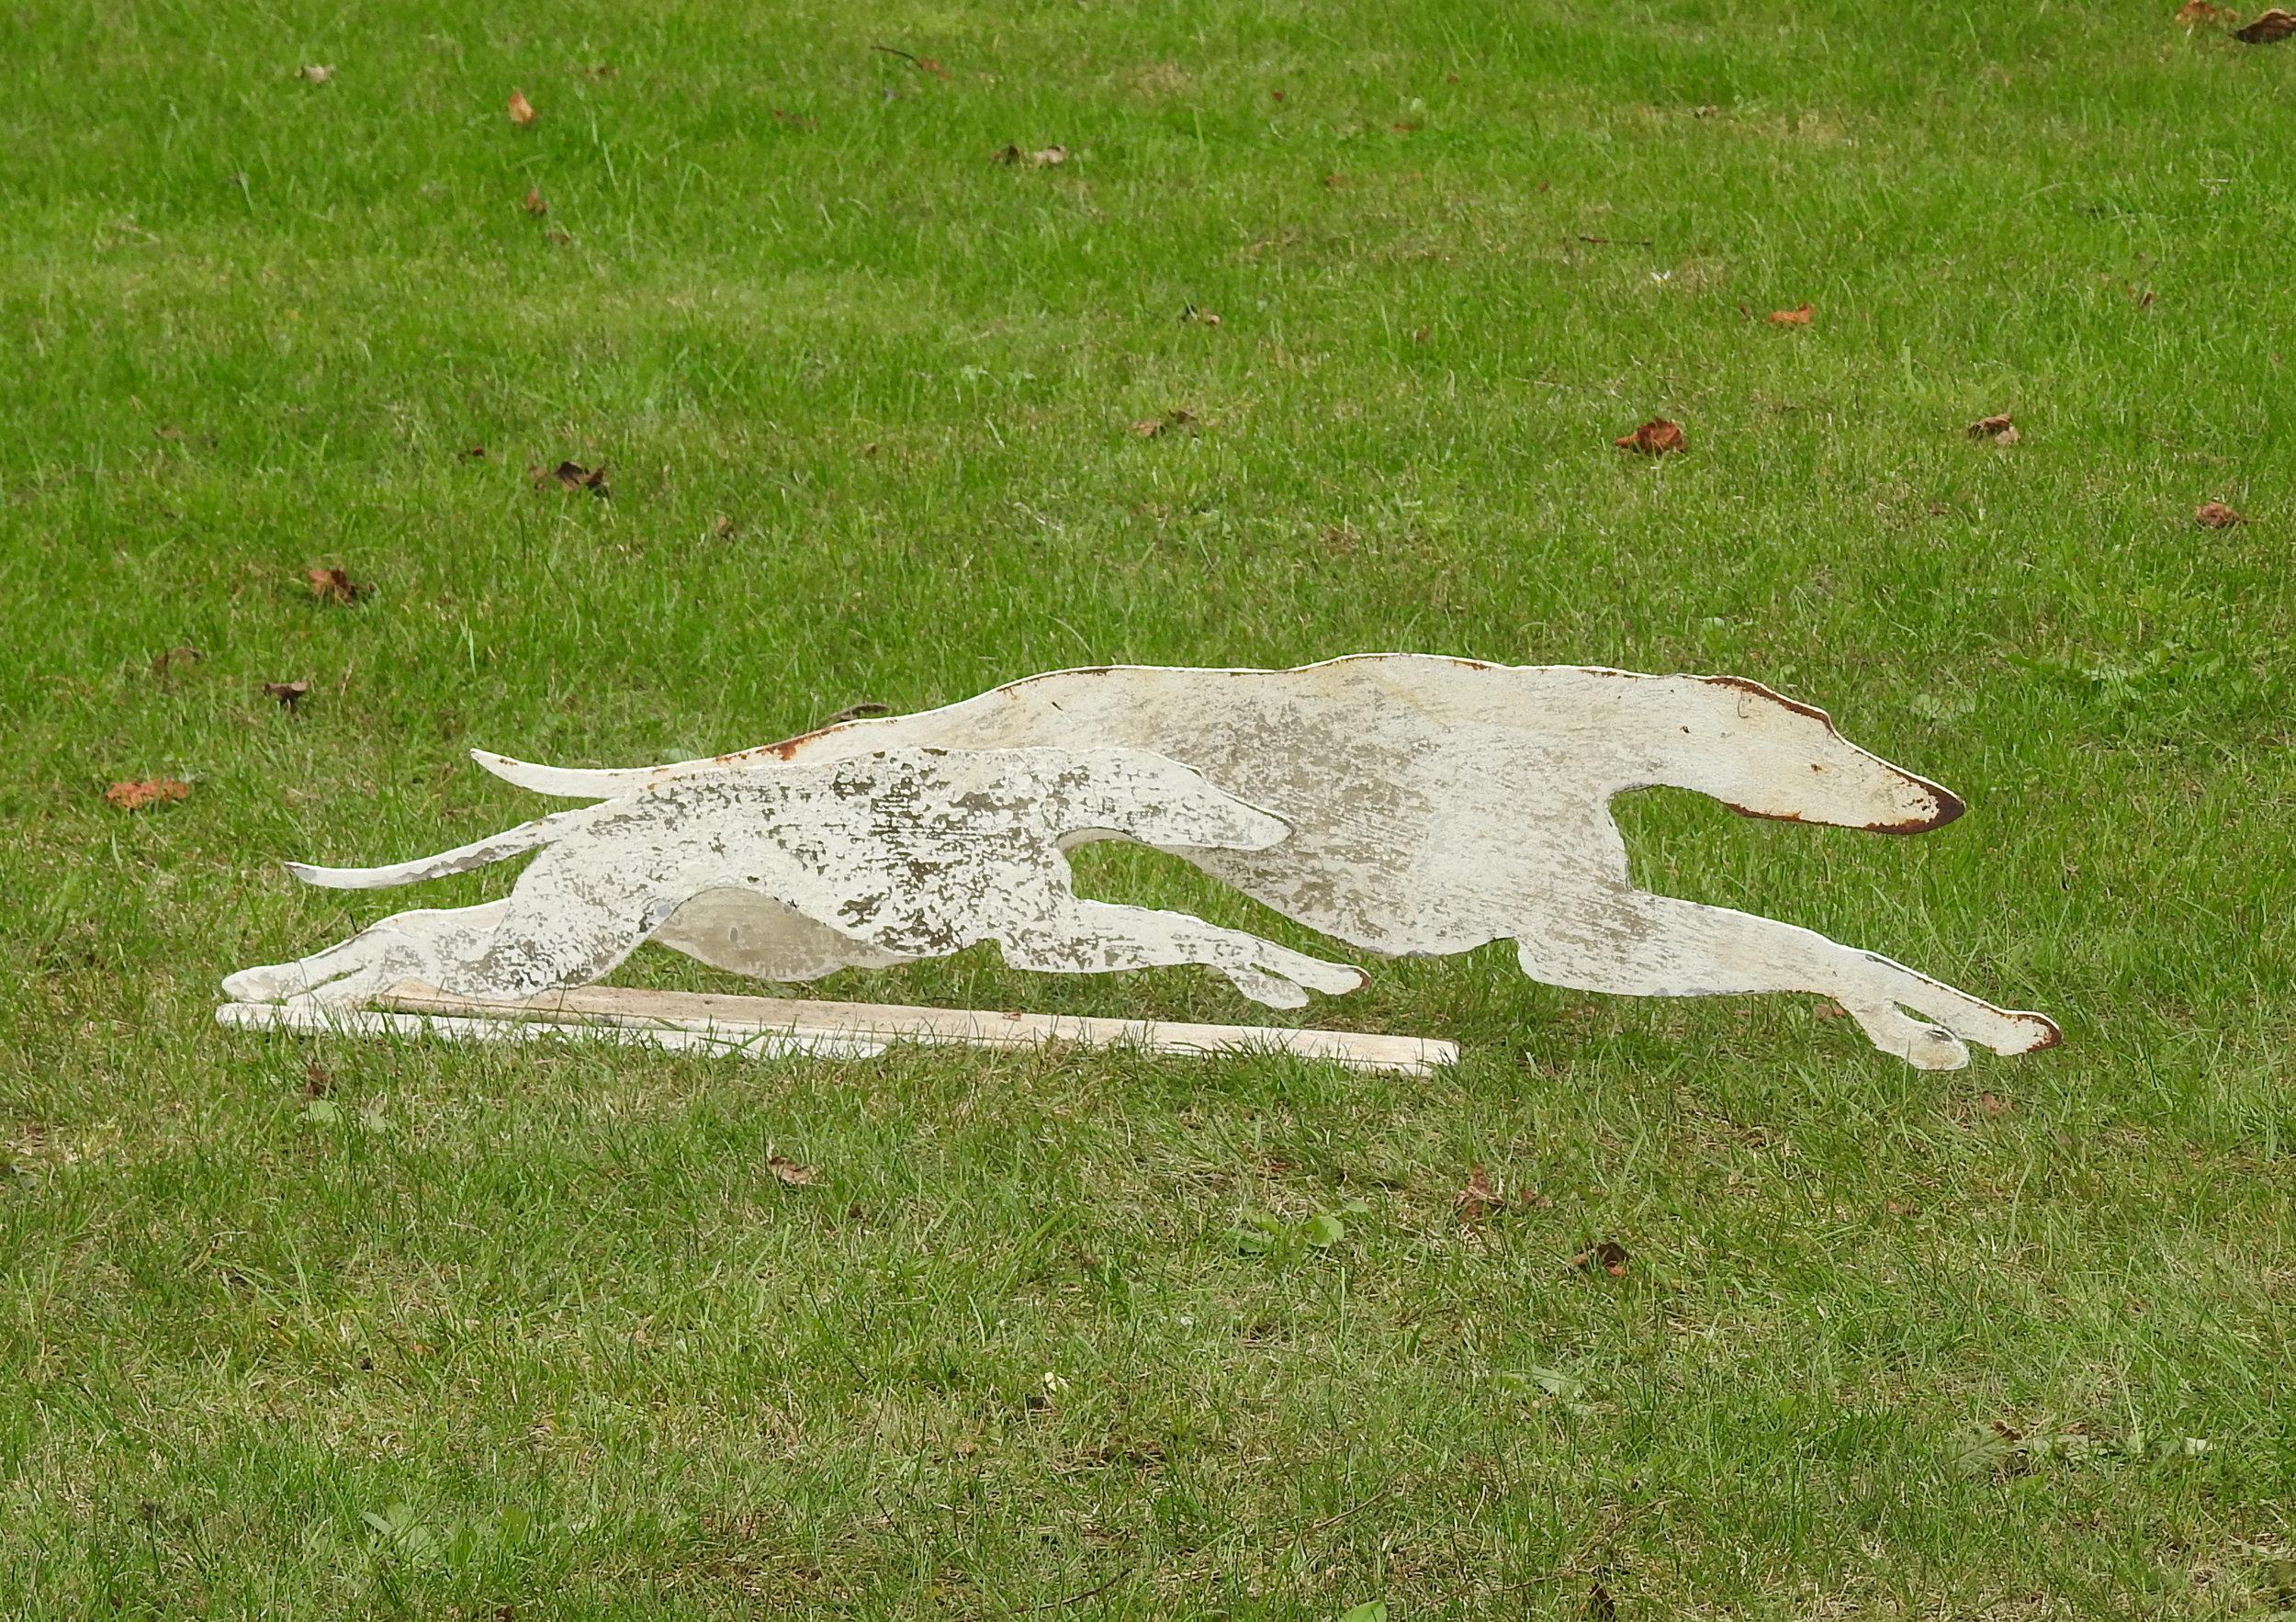 Running Whippets - £210 & £140pr - Large: 24 x 75cmSmall: 15 x 50cm